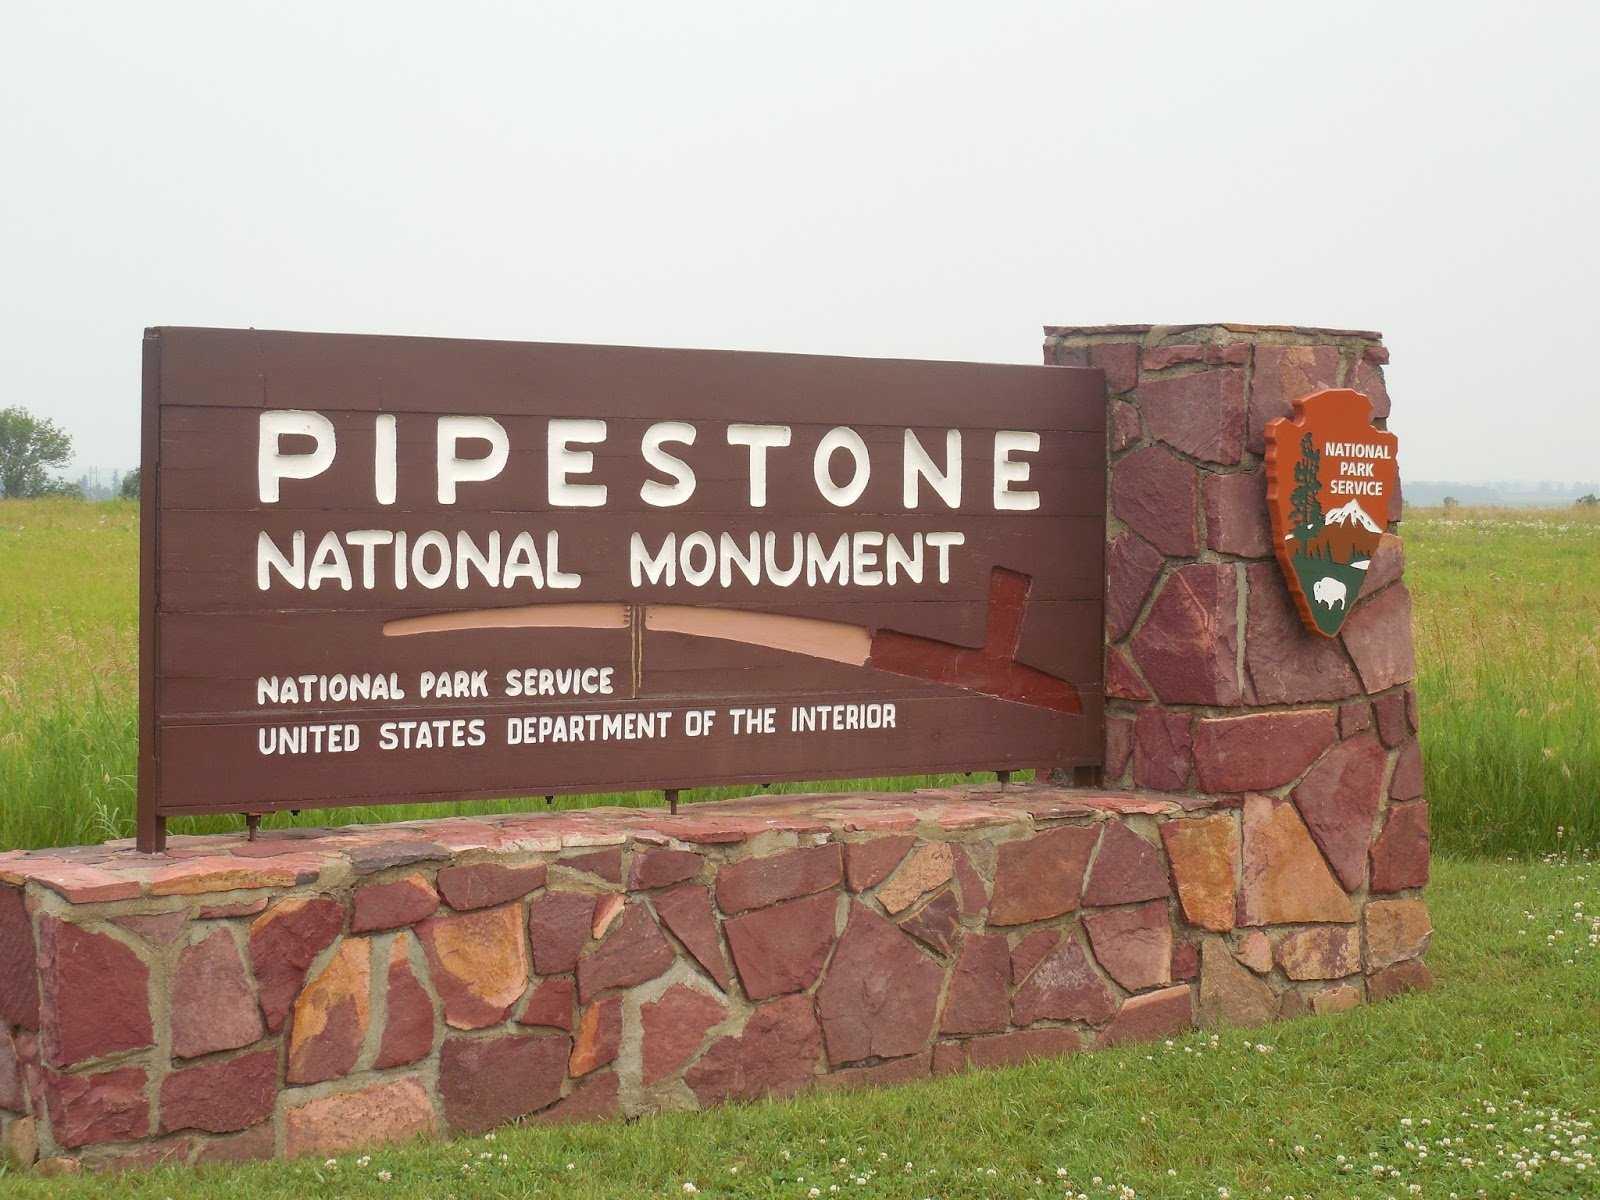 Pipestone National Monument – Minnesota – Pleasantly surprising